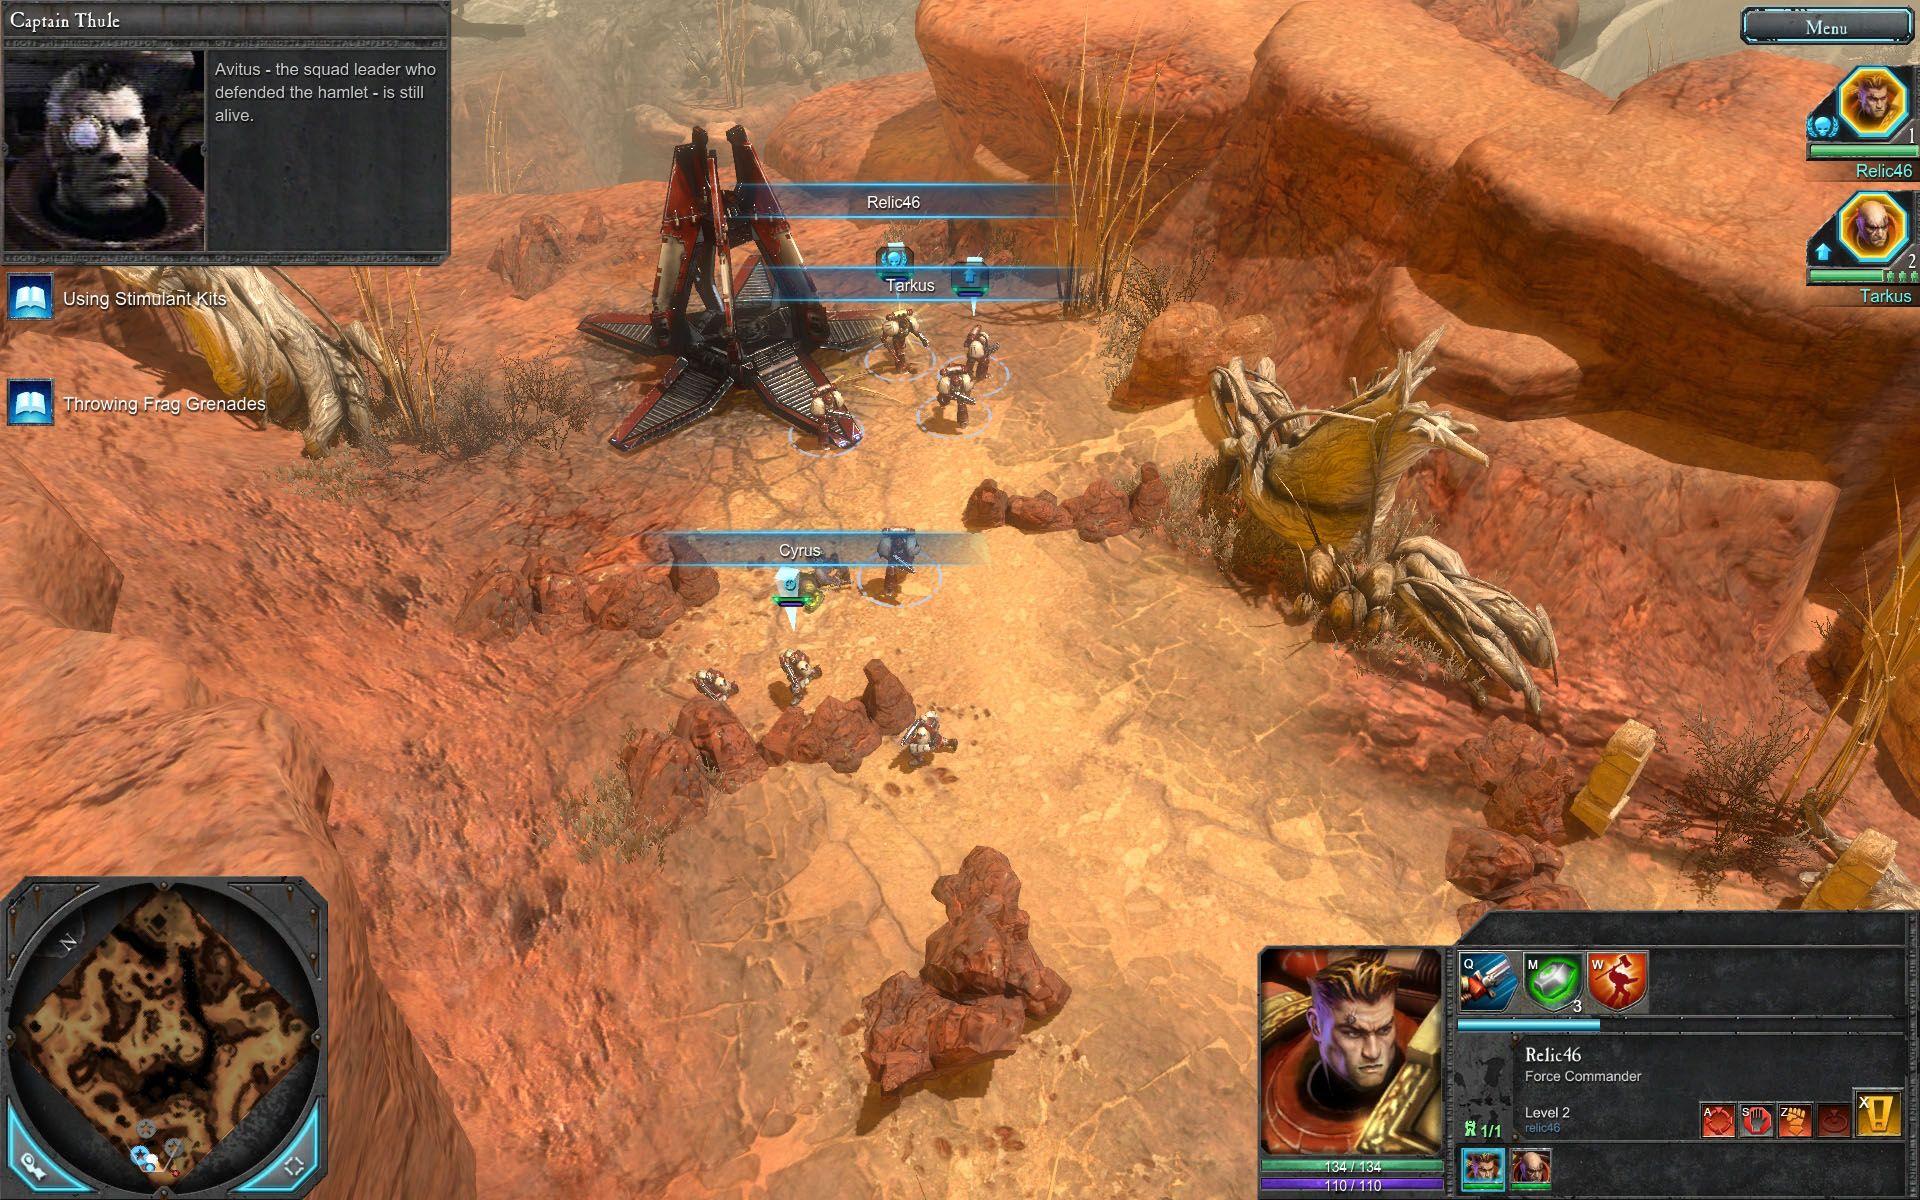 Скриншот игры Warhammer 40 000 Dawn of War 2.